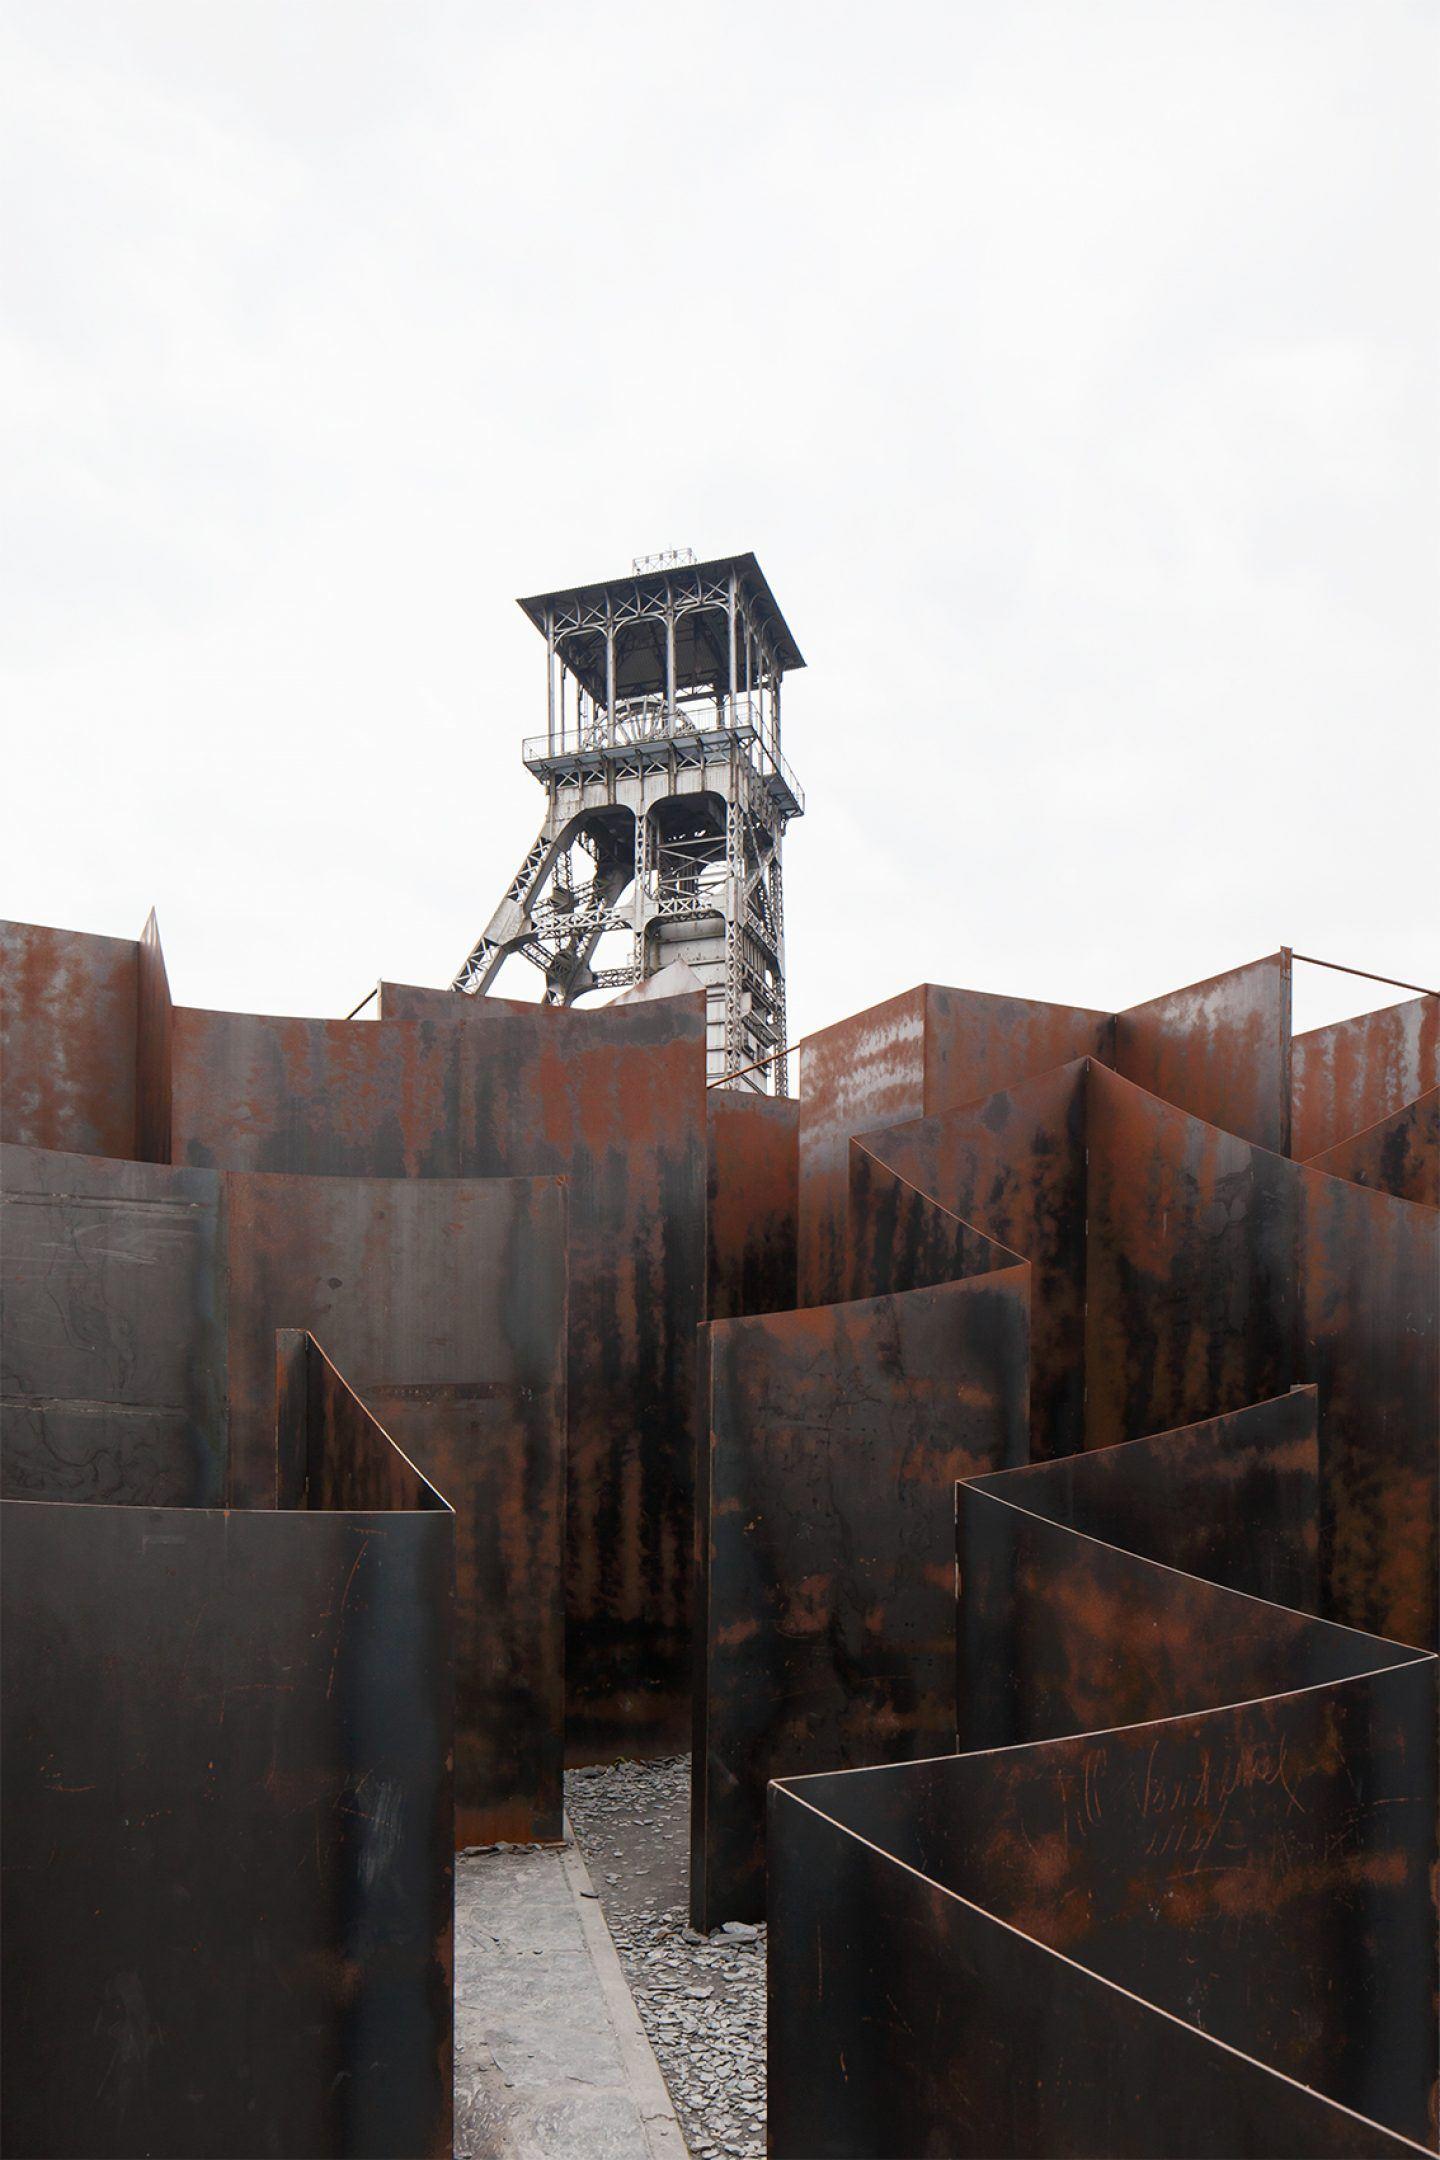 IGNANT-Architecture- Gijs-Van-Vaerenbergh-Labyrinth-Johnny-Umans-019